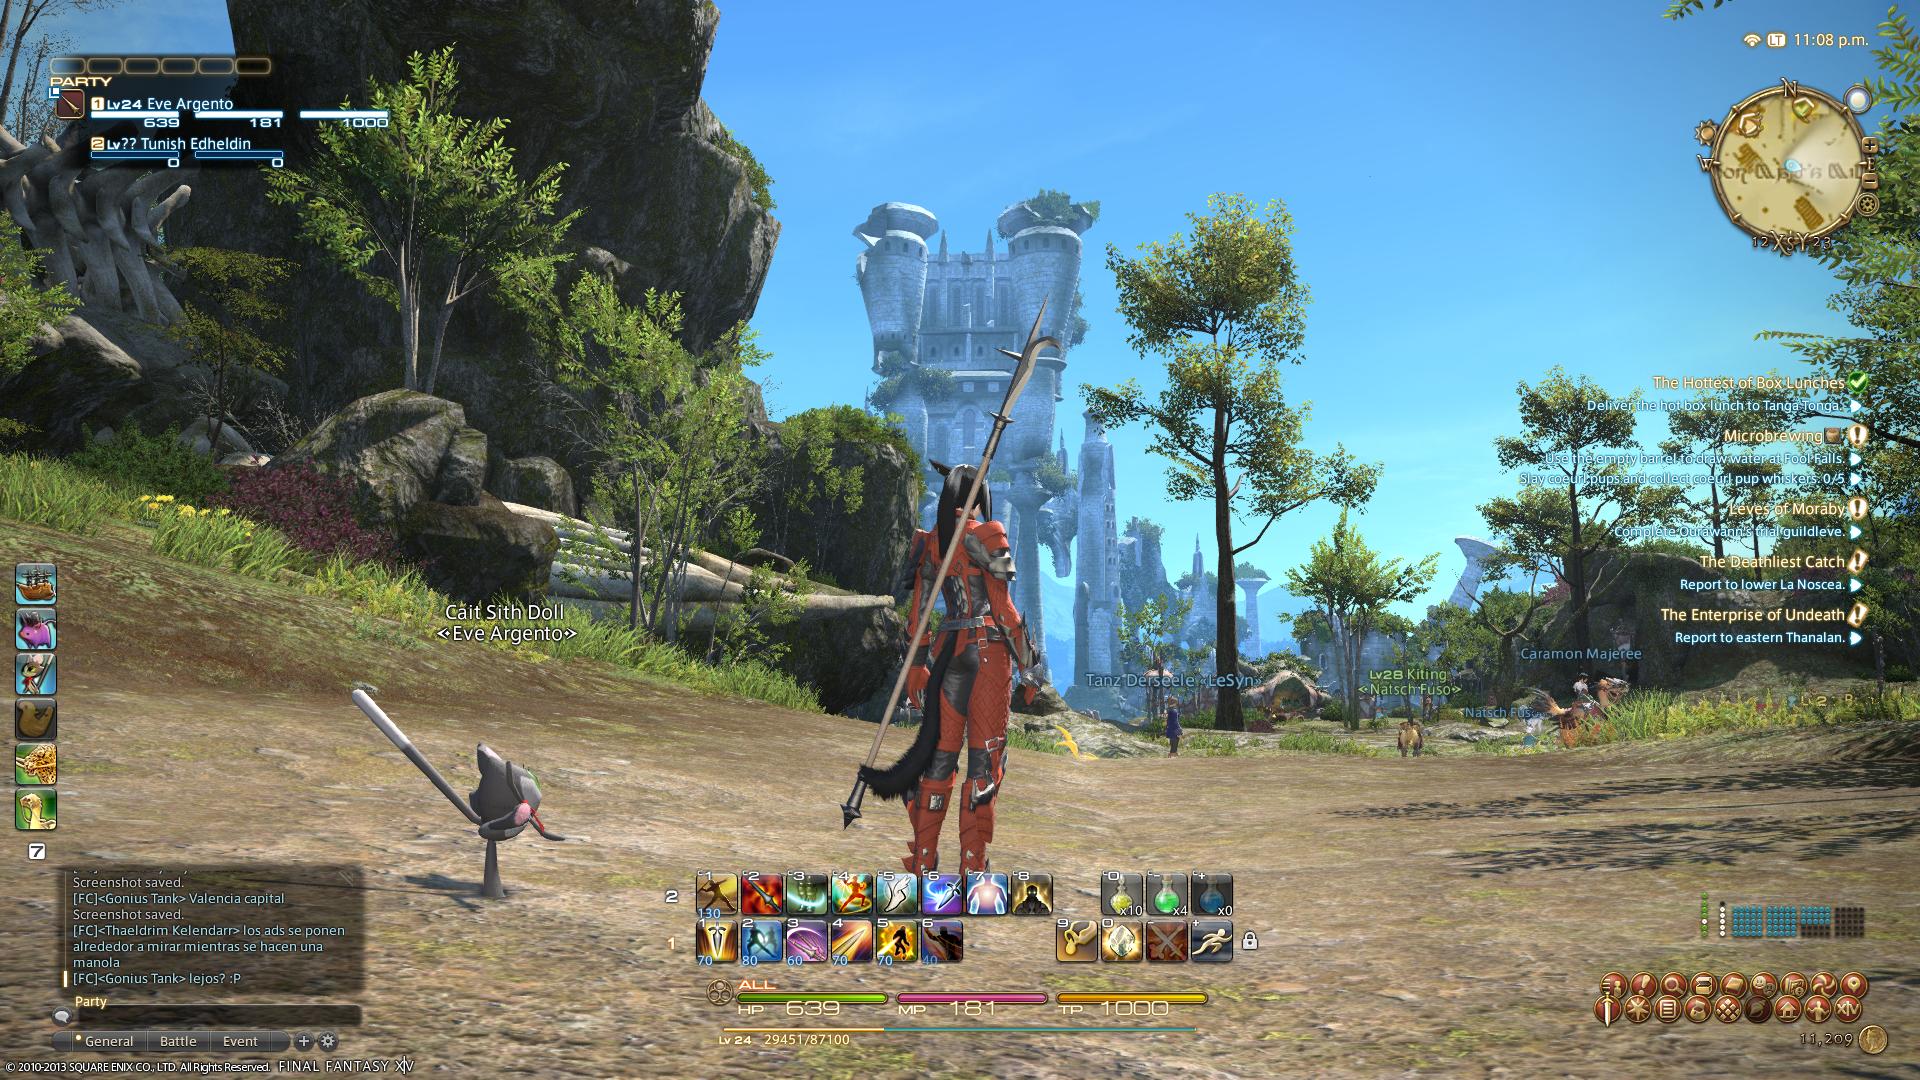 Imagenes De Final Fantasy Xiv A Realm Reborn Meristation